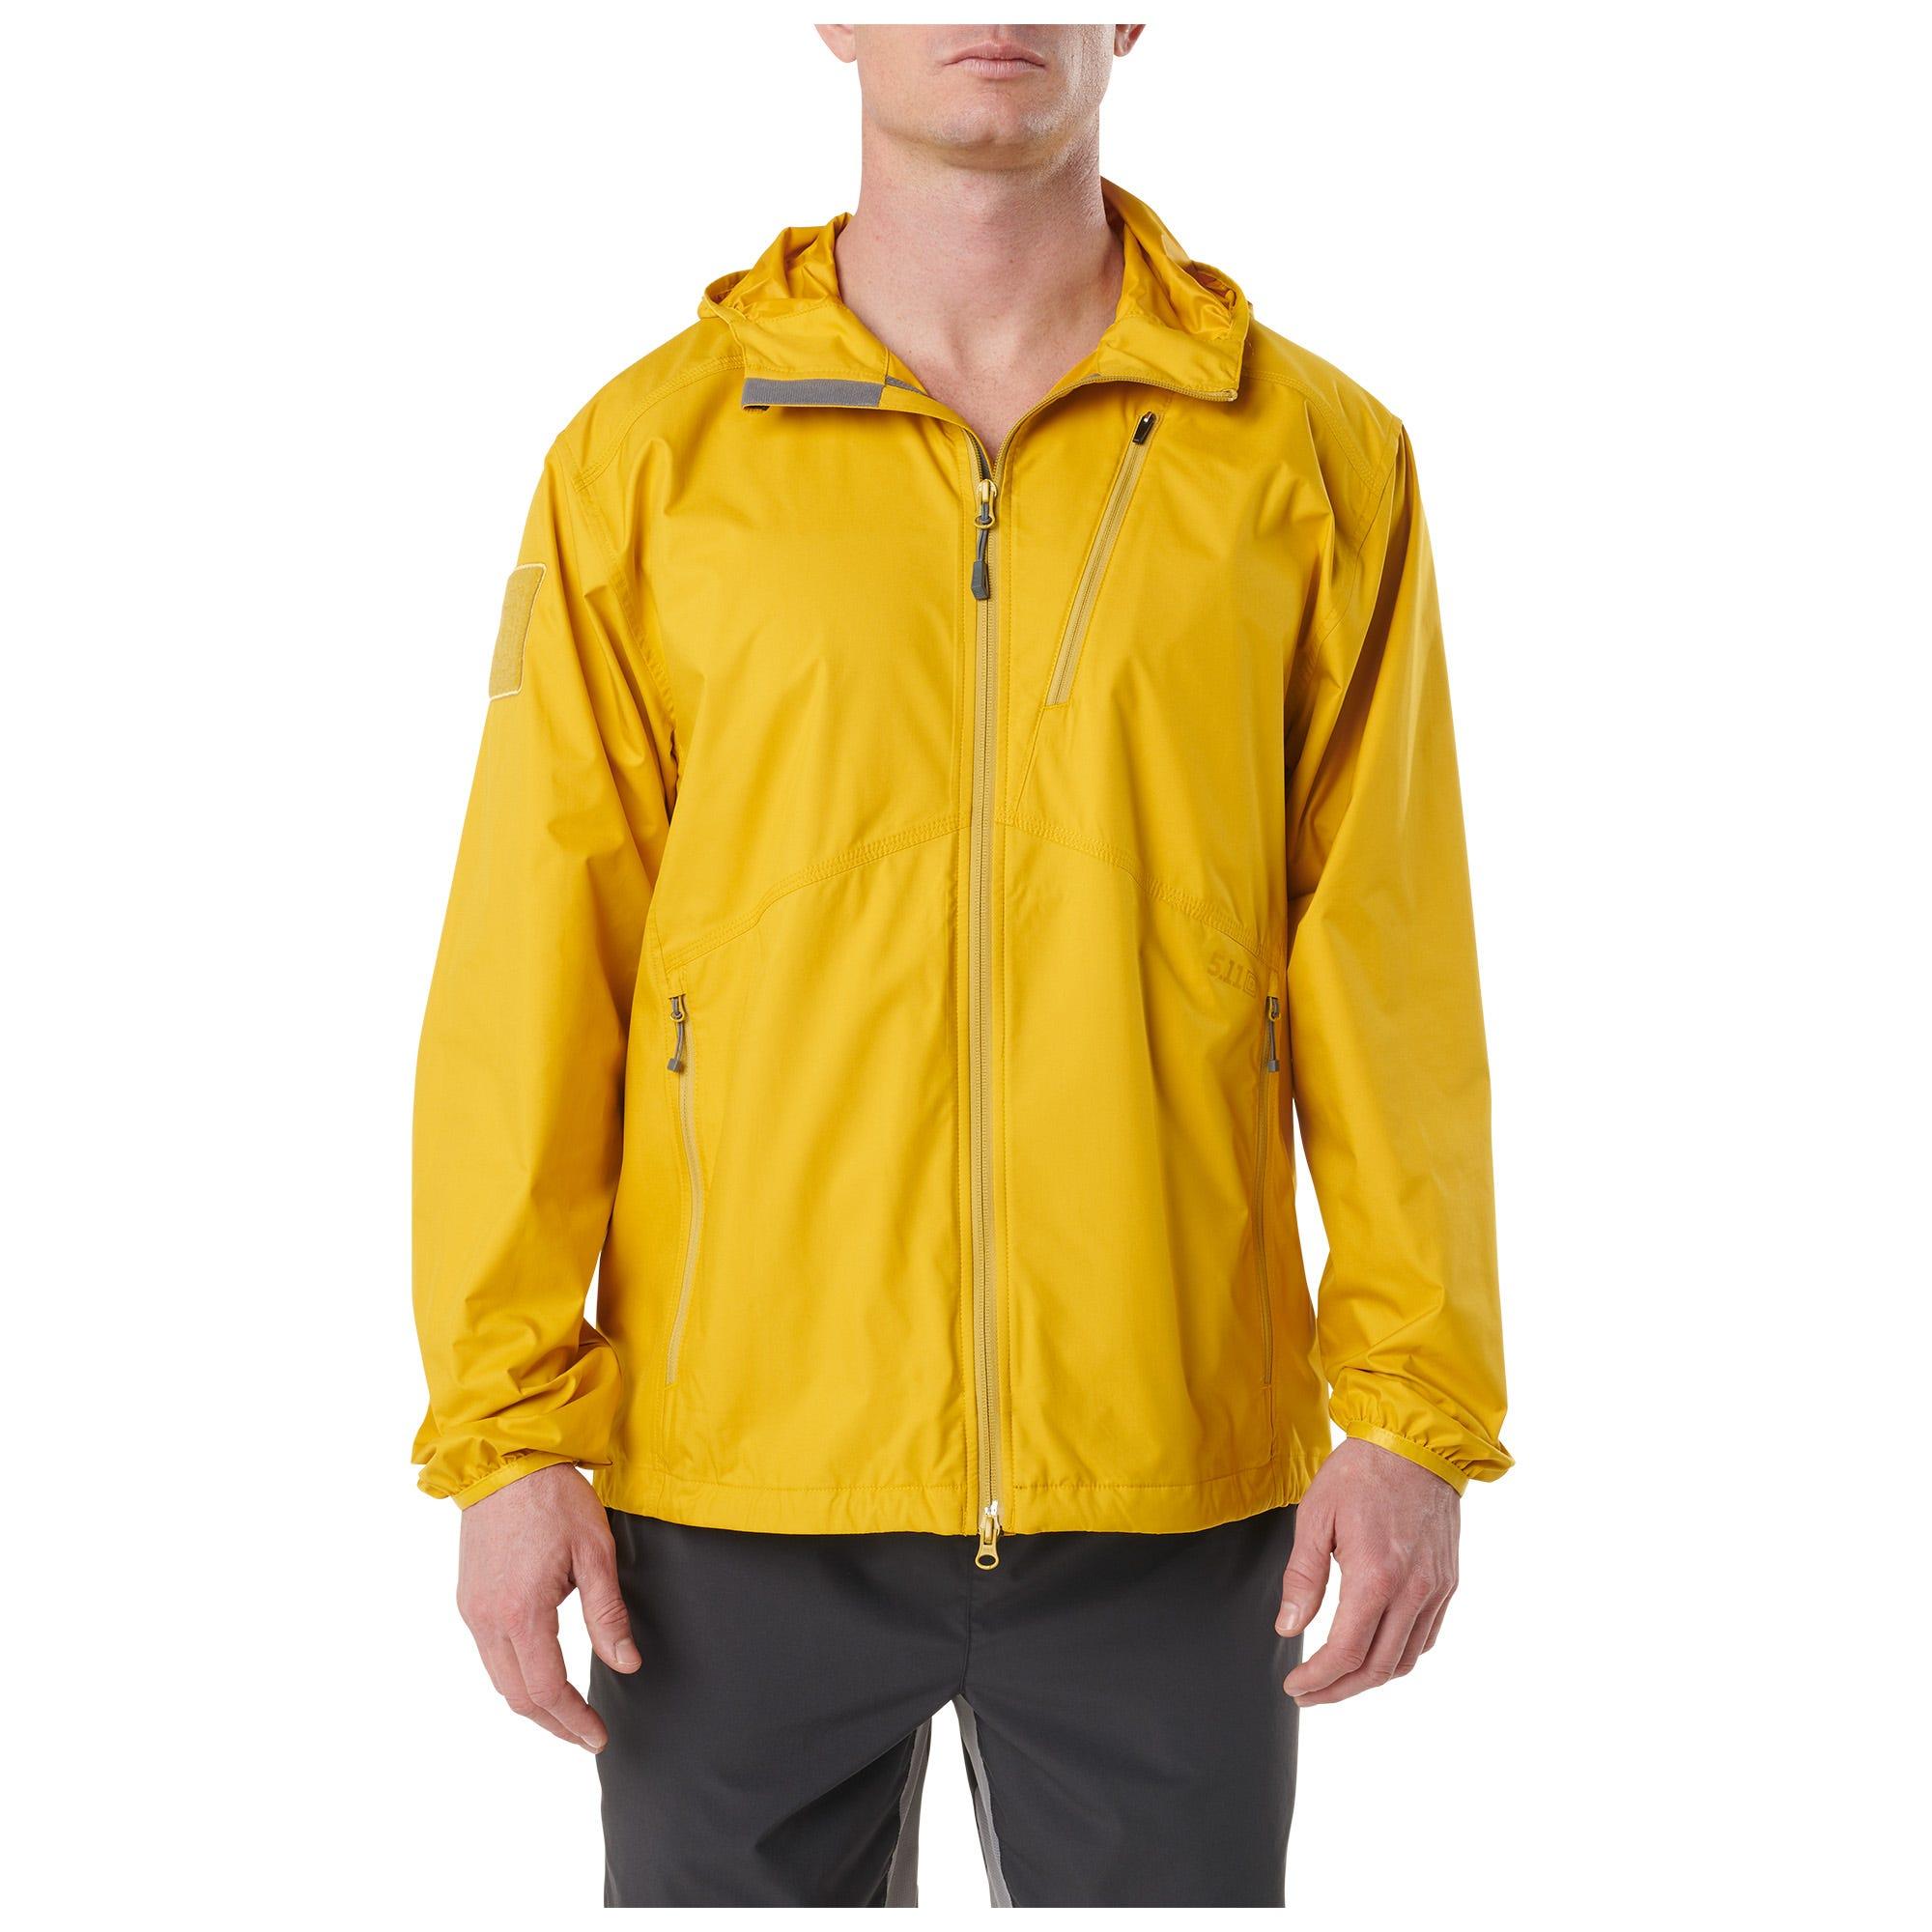 5.11 Tactical Men's Cascadia Windbreaker Packable Jacket (Green)